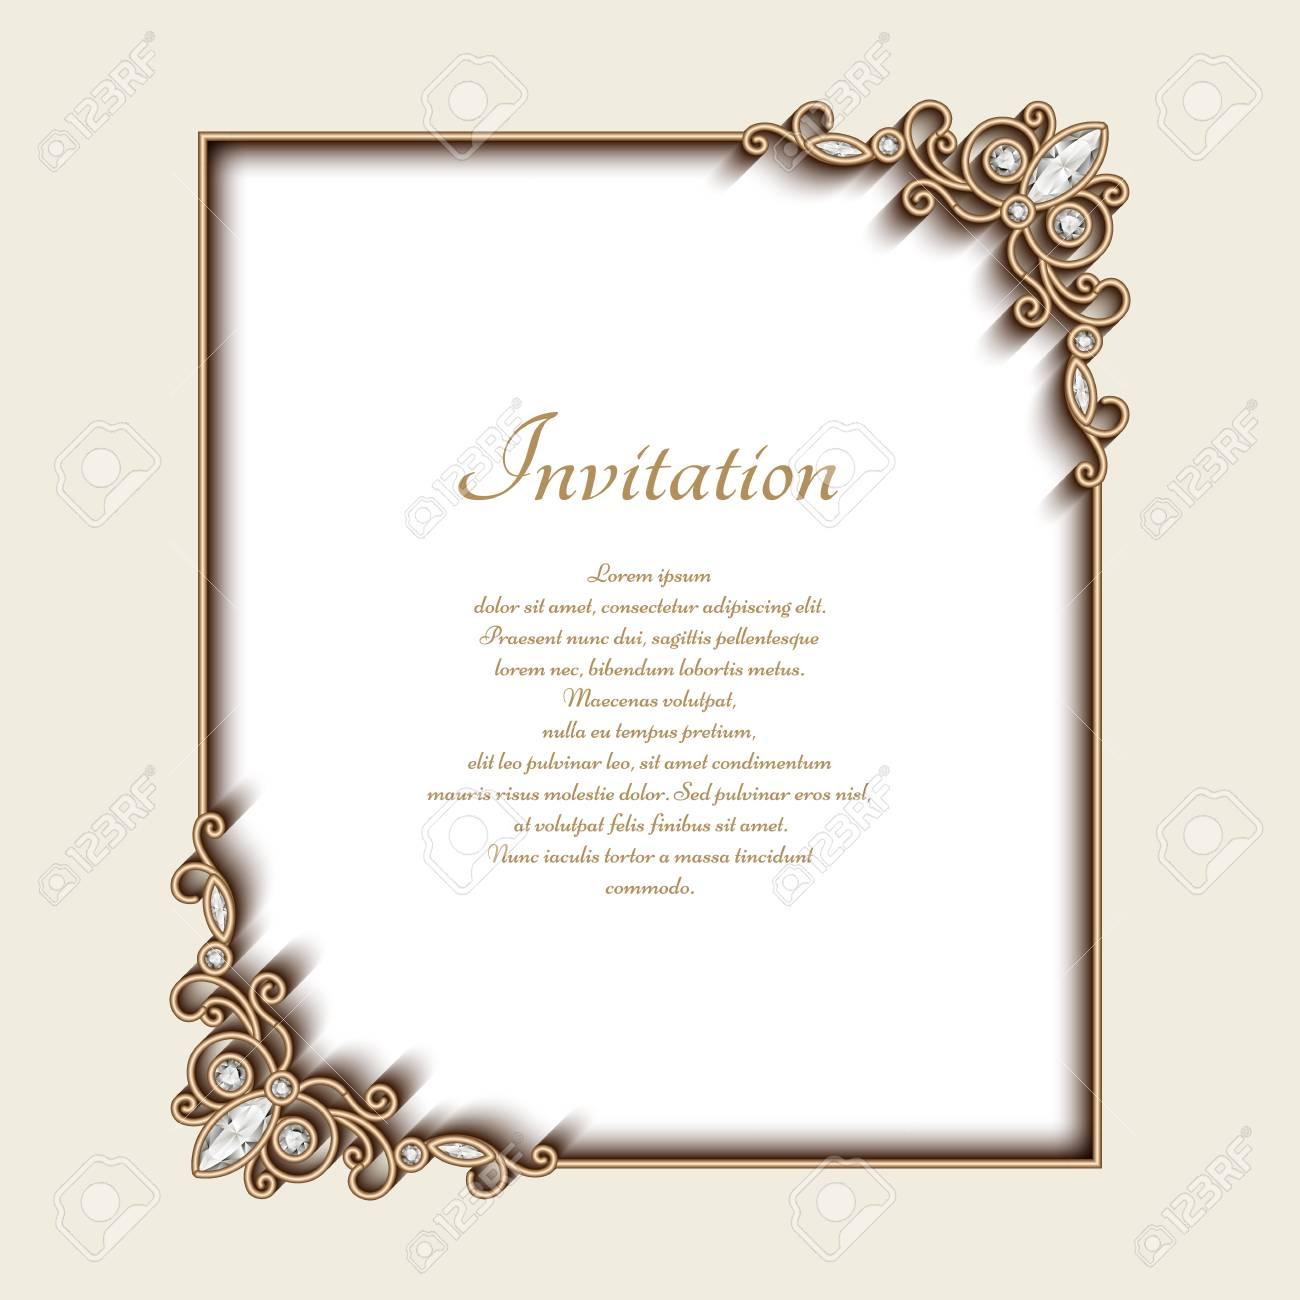 Vintage photo frame with gold jewelry border and corner decoration vector vintage photo frame with gold jewelry border and corner decoration greeting card or invitation design stopboris Choice Image